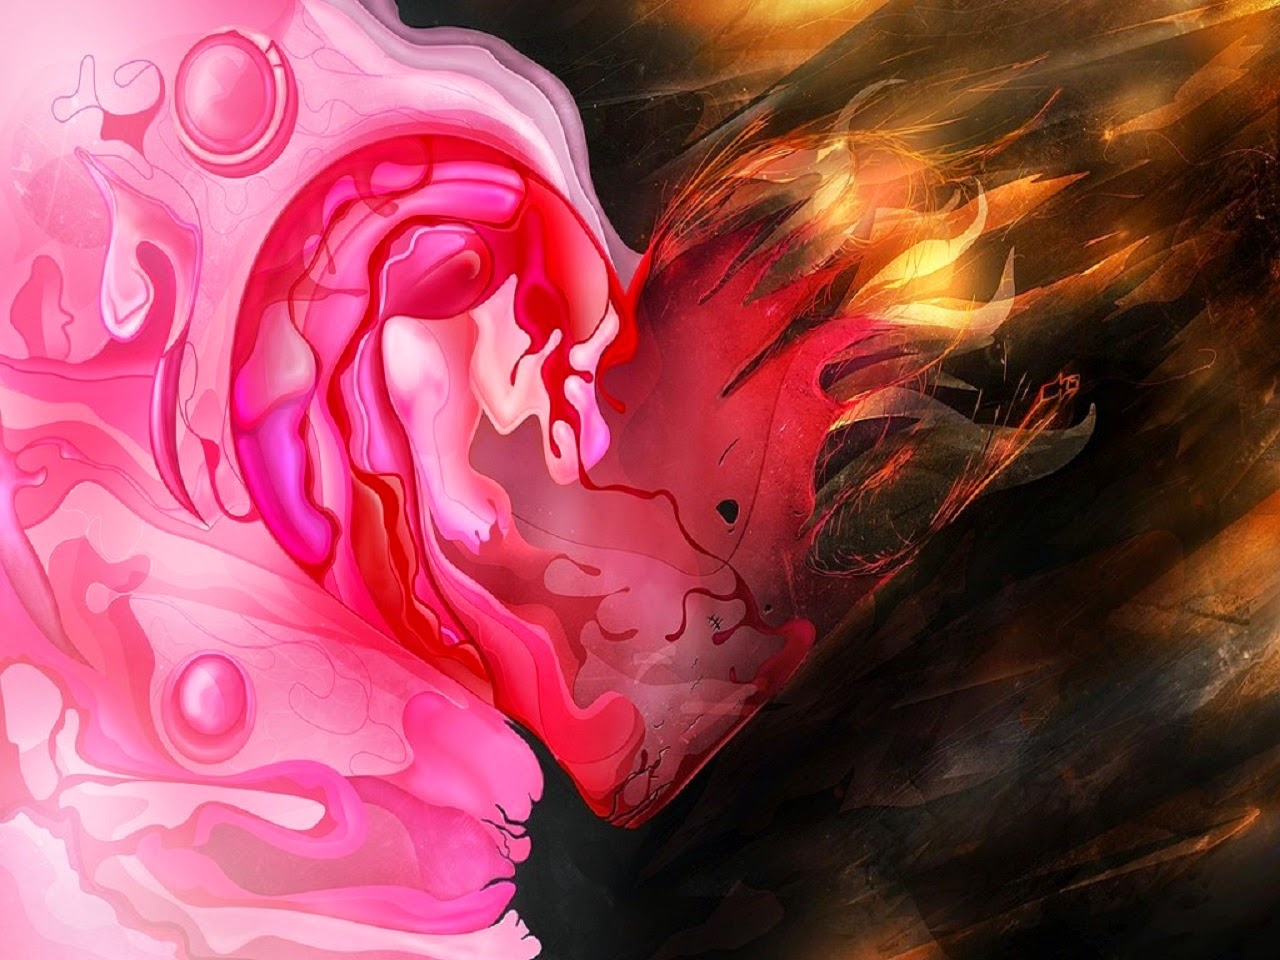 Love Heart Blood Wallpaper : Romantic Love Heart Designs HD cover Wallpaper PIXHOME